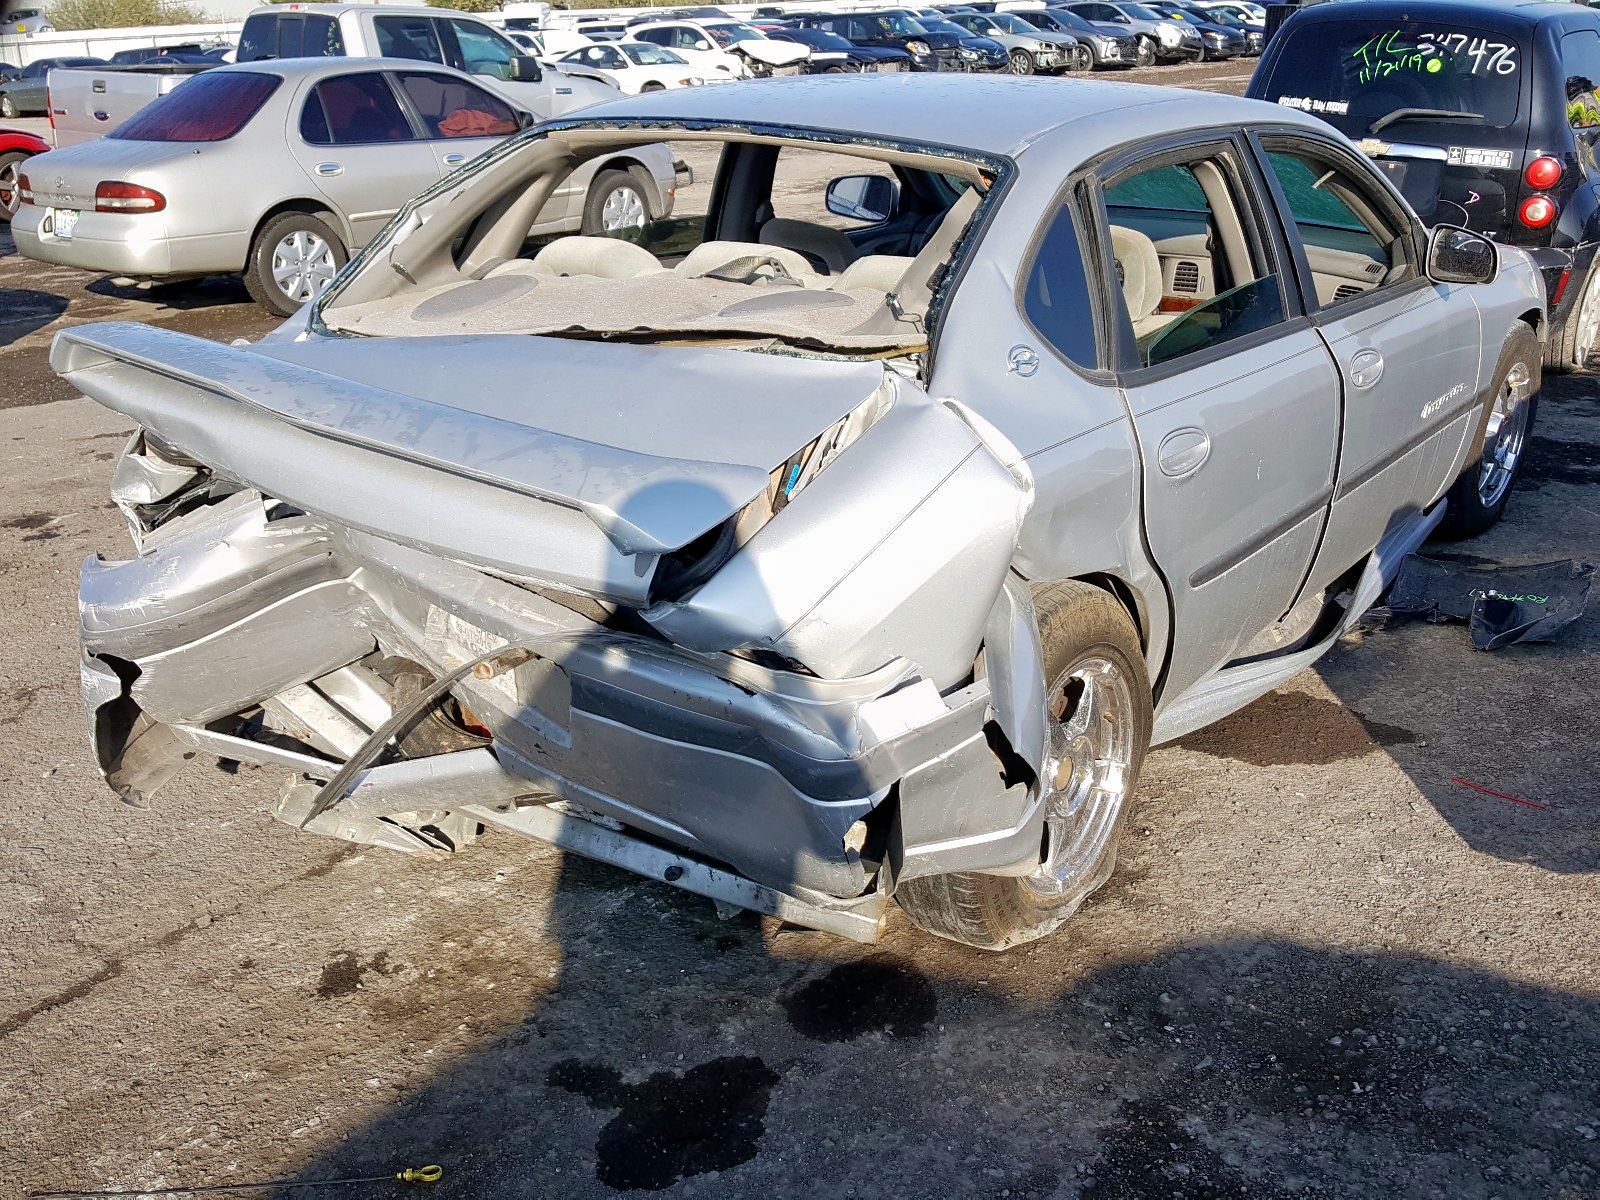 2000 Chevrolet Impala Ls 3.8L rear view